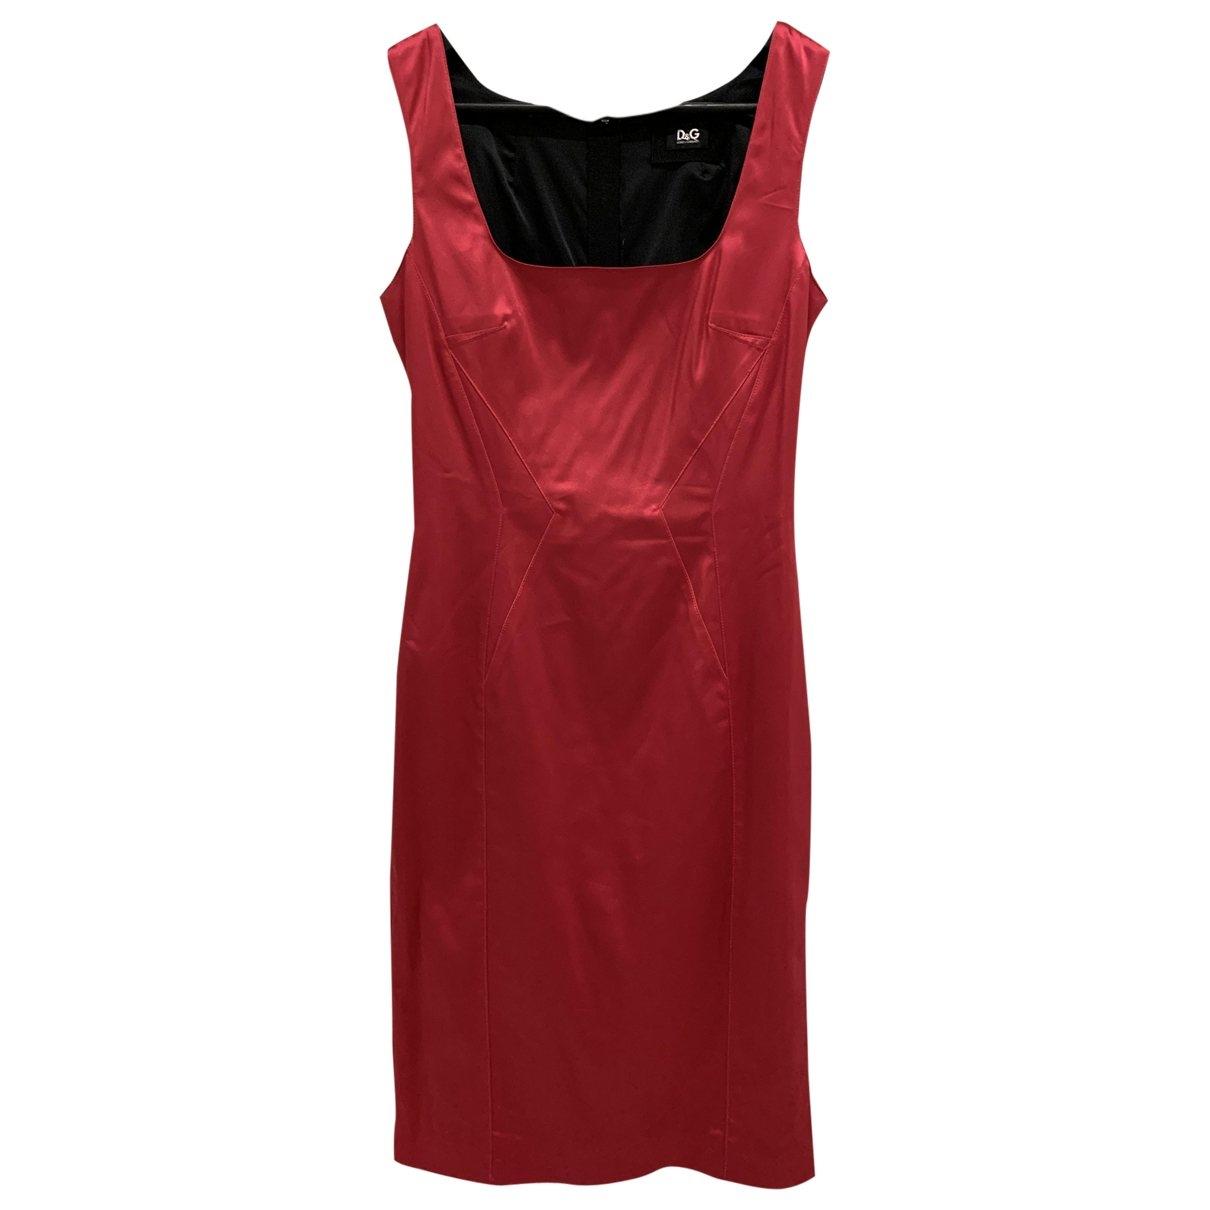 D&g \N Pink dress for Women 40 IT